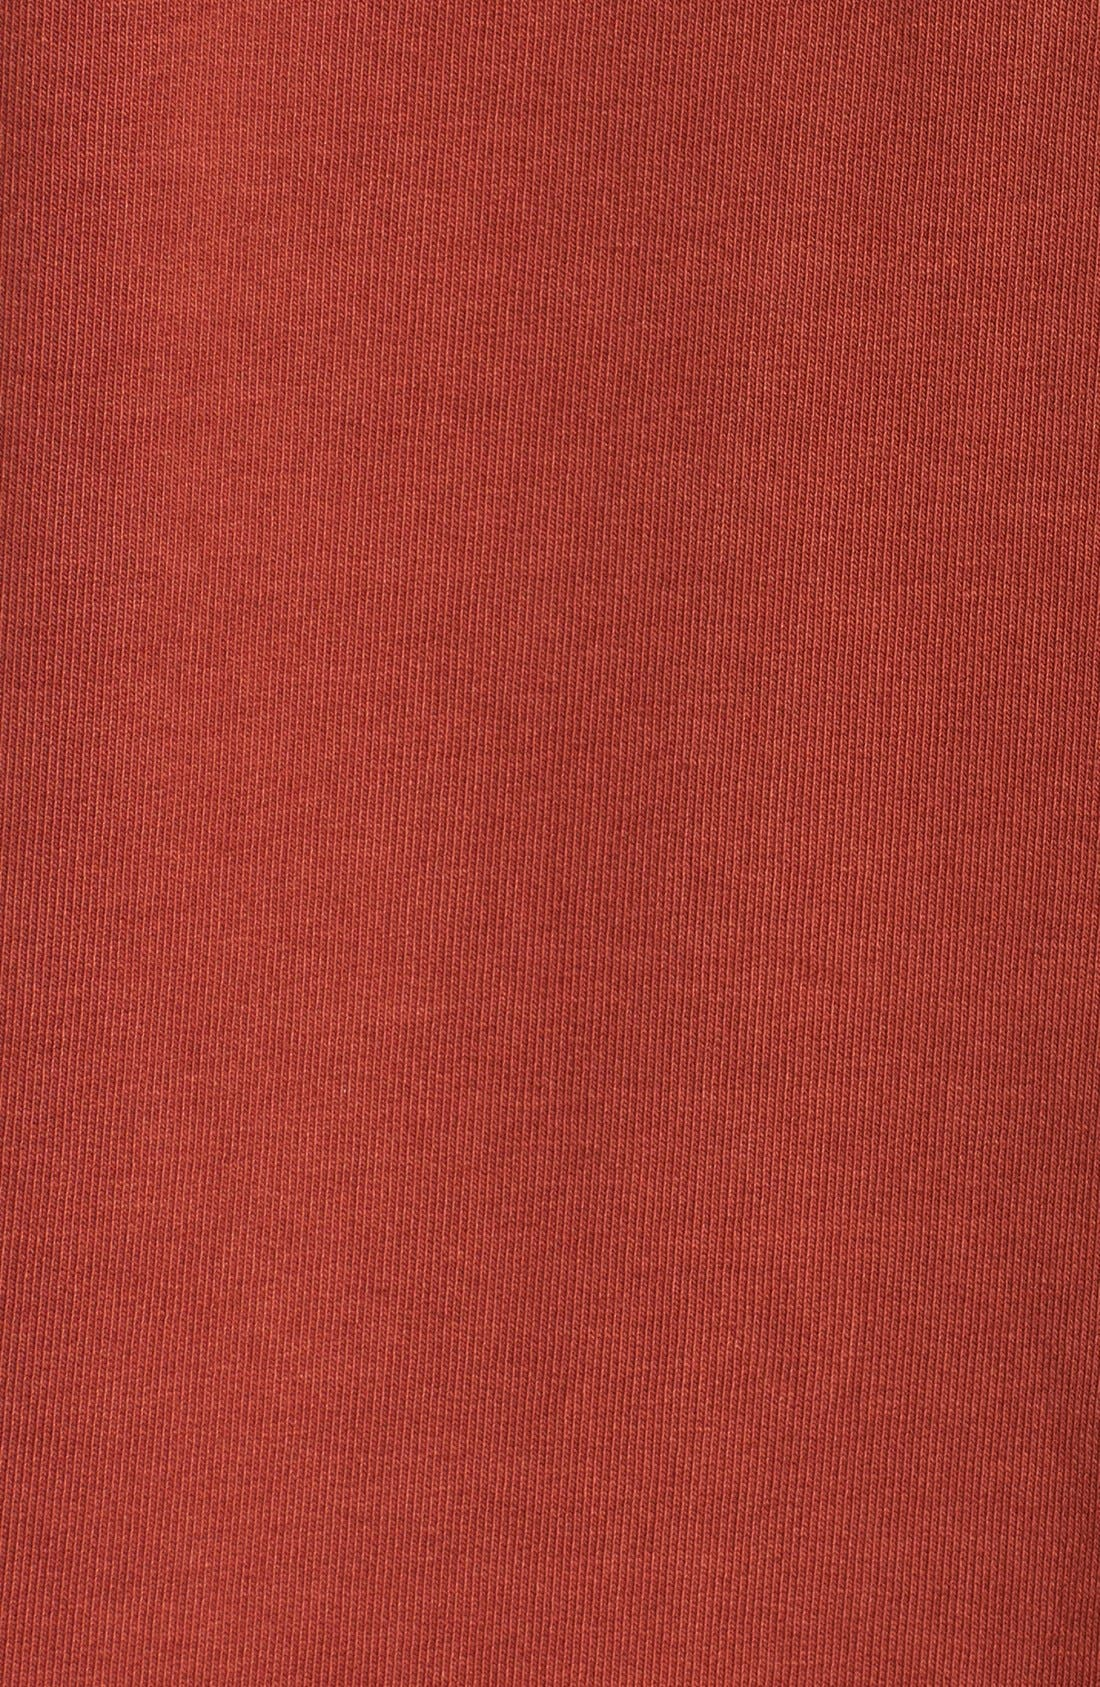 Alternate Image 3  - Tommy Bahama Denim 'New Ben & Terry' Island Modern Fit Half Zip Pullover